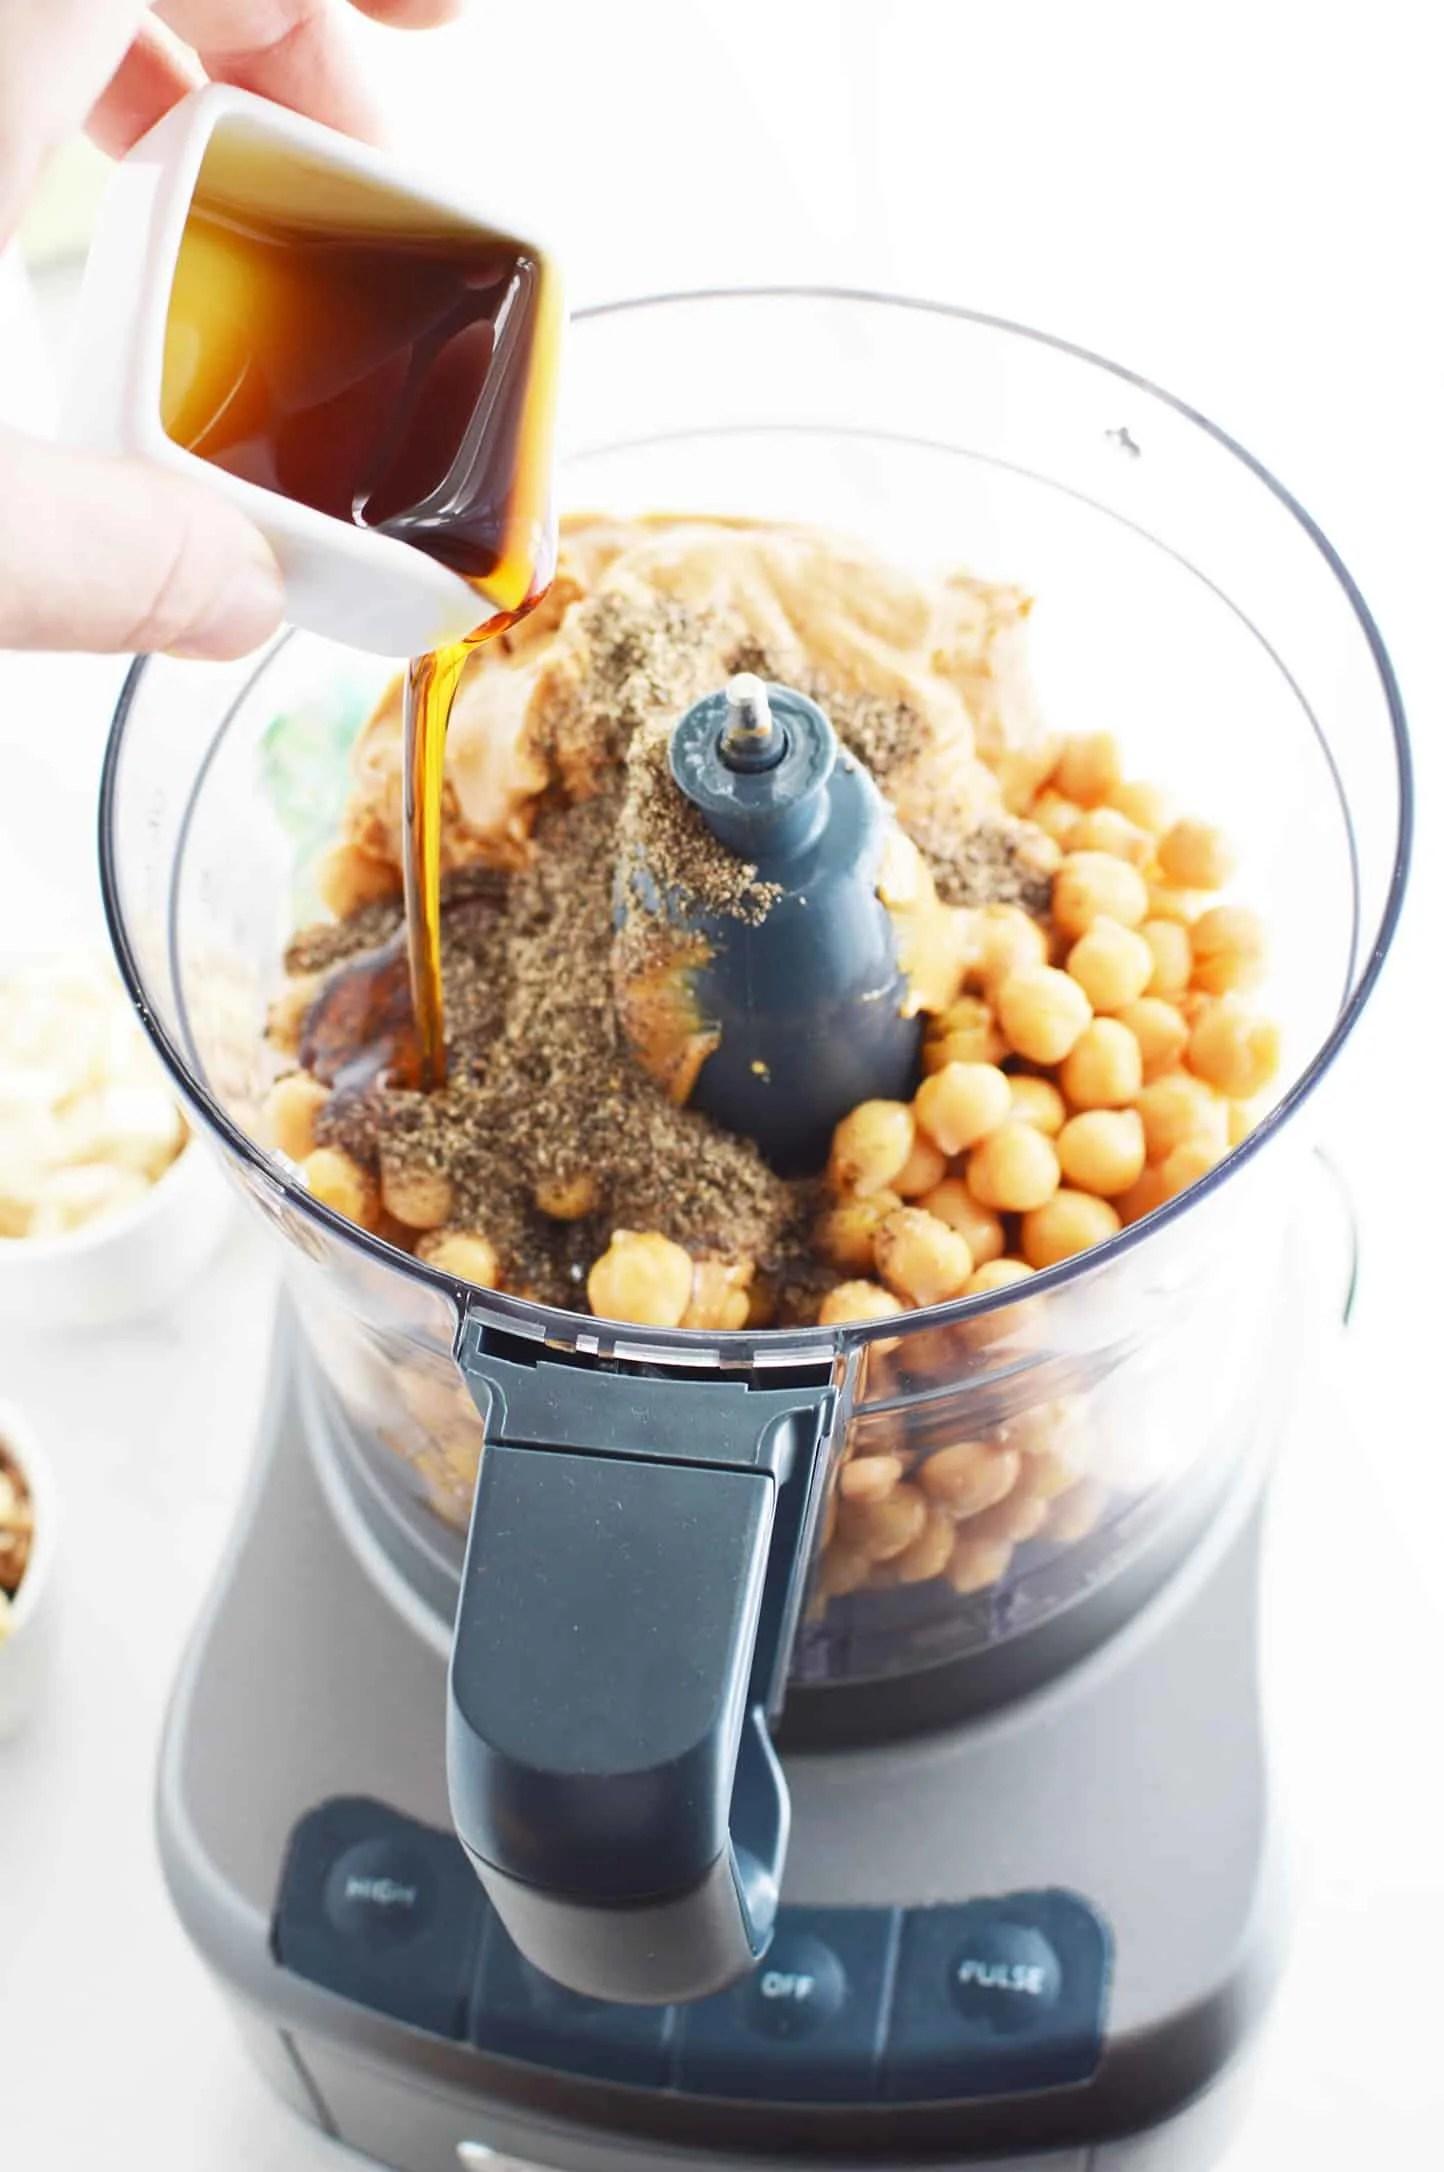 Healthy Edible Cookie Dough ingredients in a food processor.